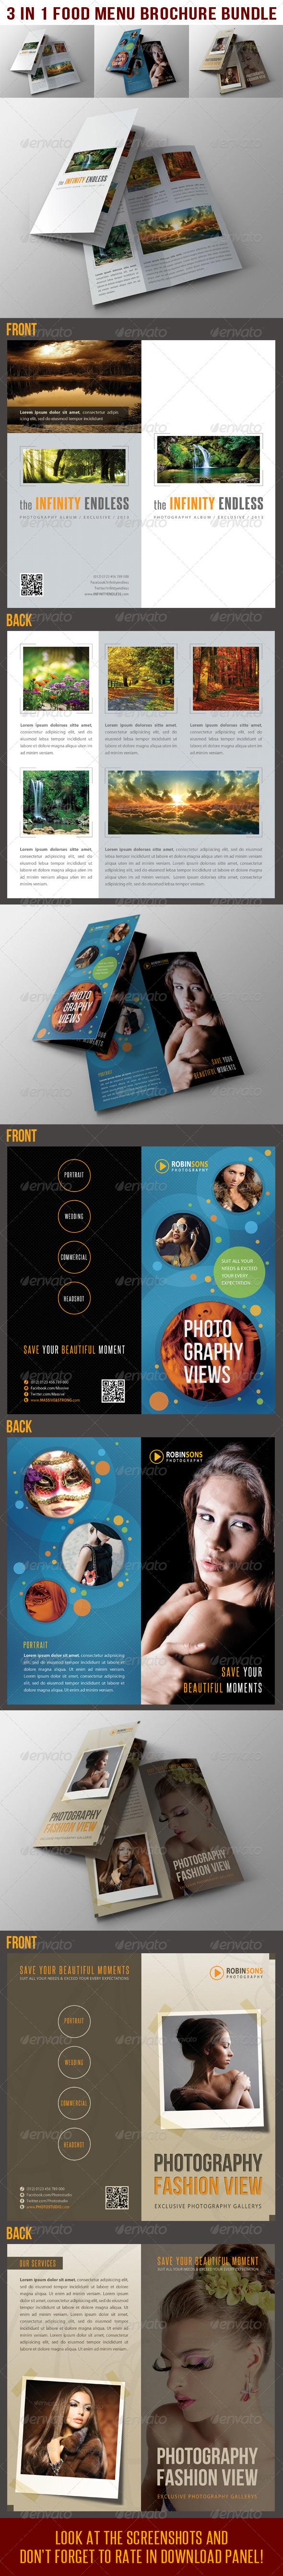 3 in 1 Photography BiFold Brochure Bundle 02 - Catalogs Brochures